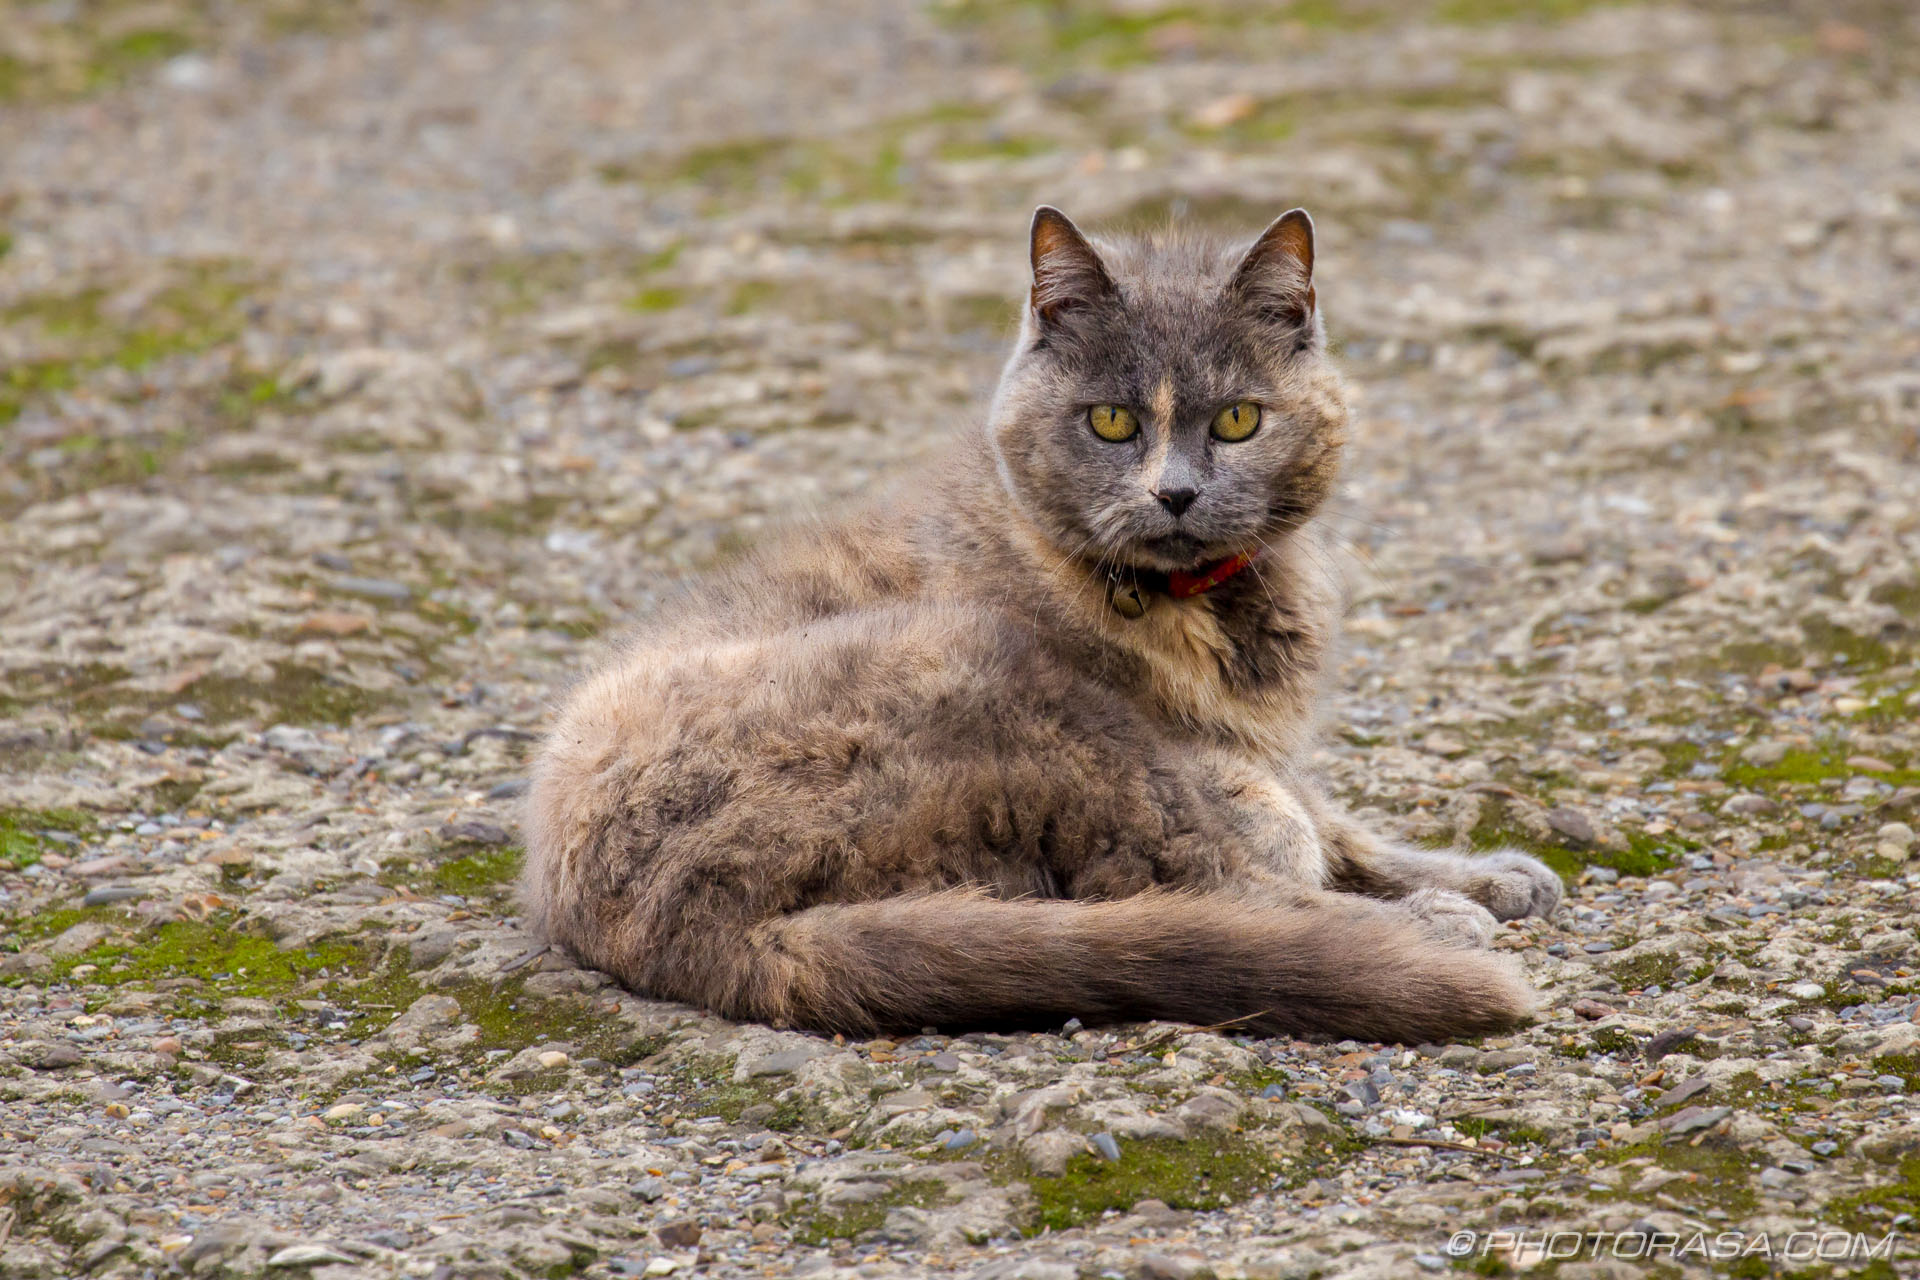 http://photorasa.com/grey-ginger-moggy/grey-ginger-cat-2/